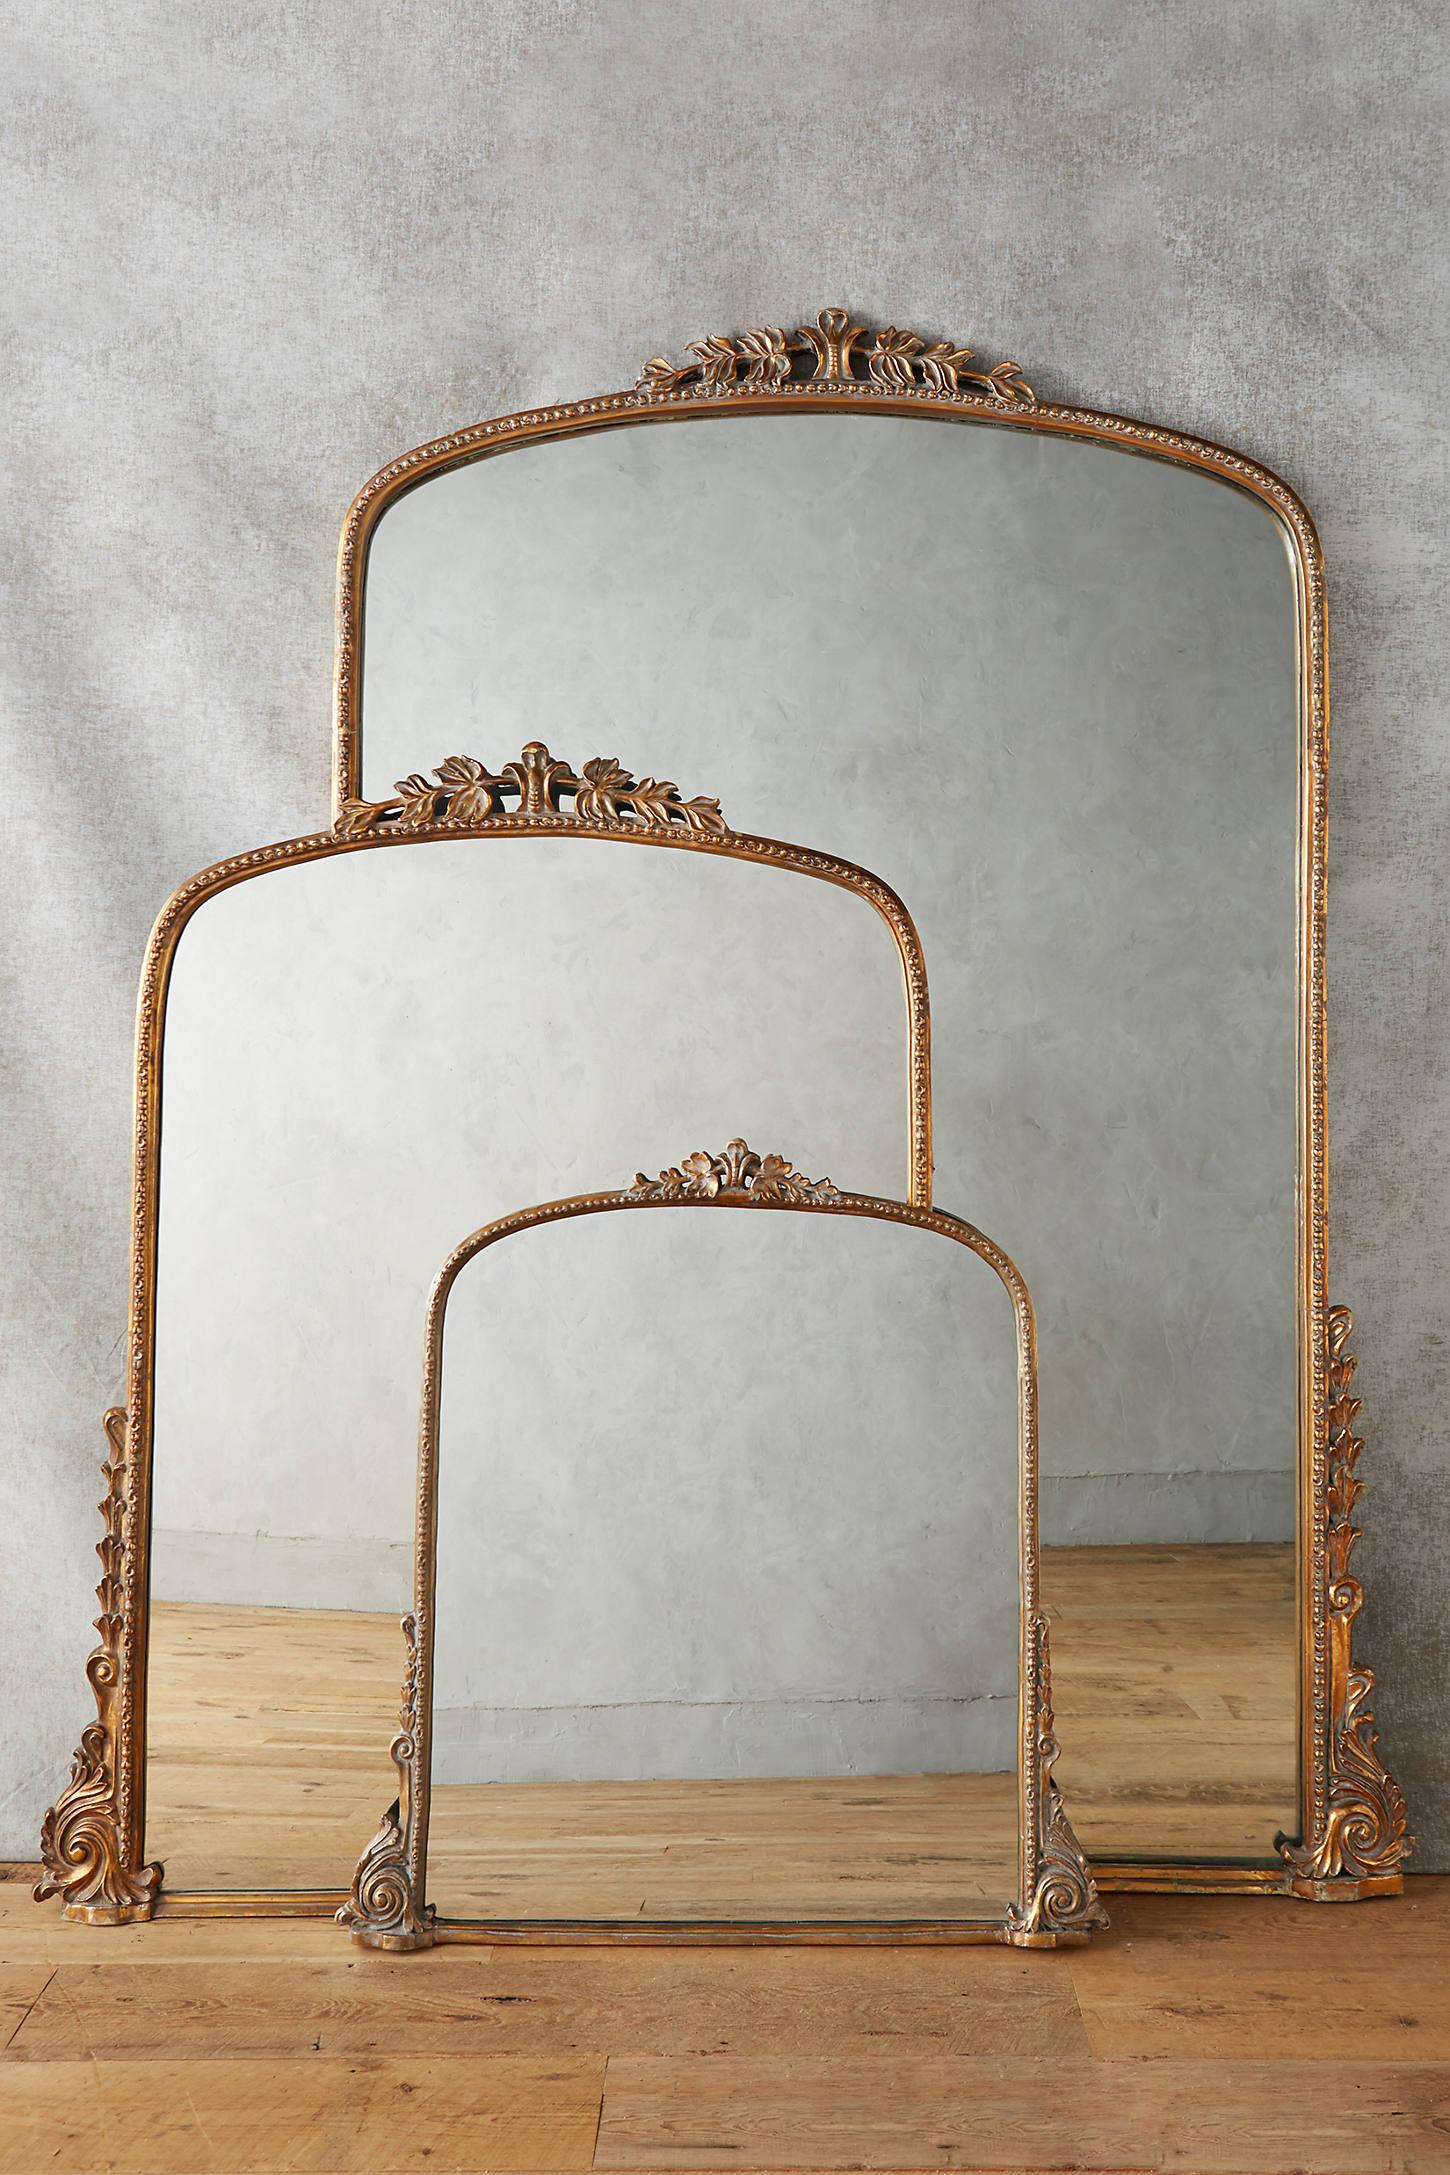 anthropology mirror